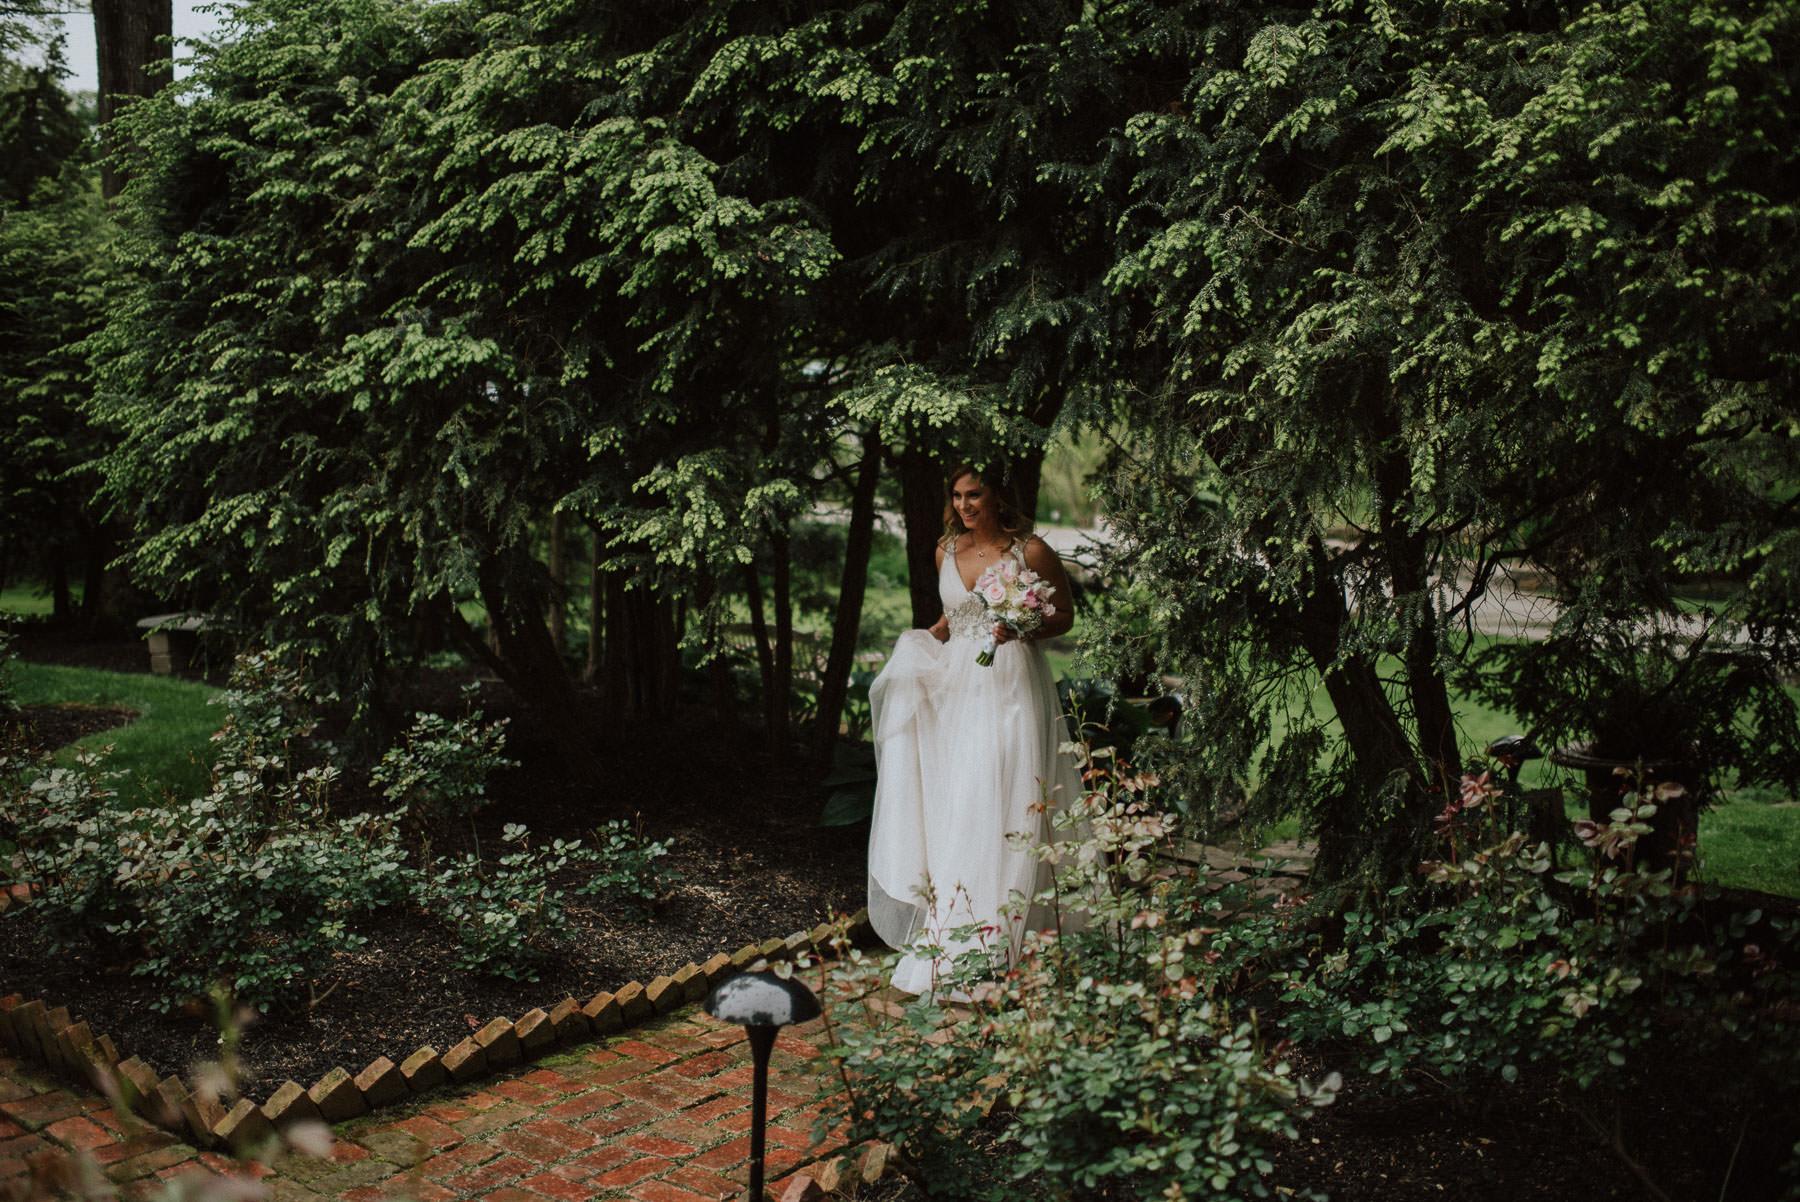 appleford-estate-wedding-photography-26.jpg